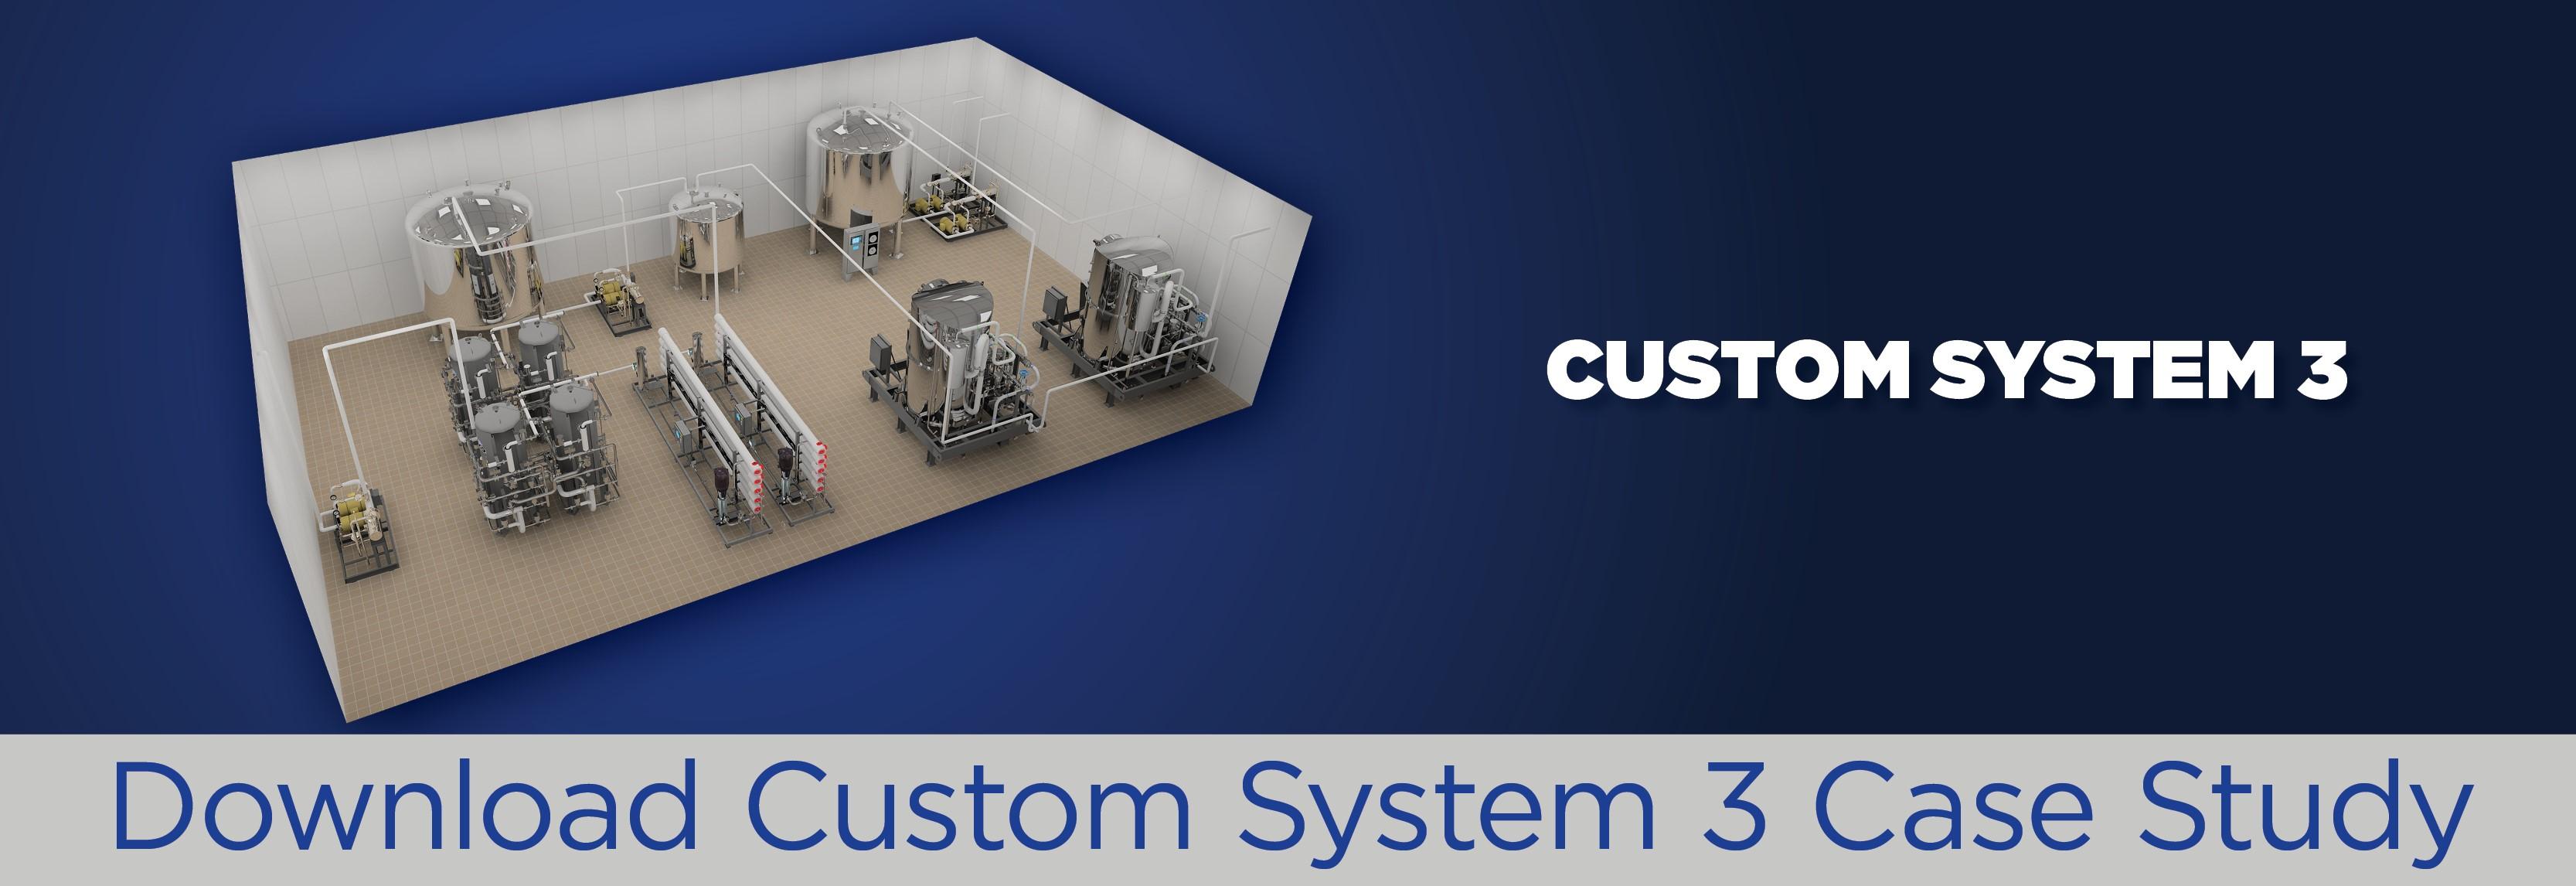 Lander Banner_Customer System 3_Case Study.jpg